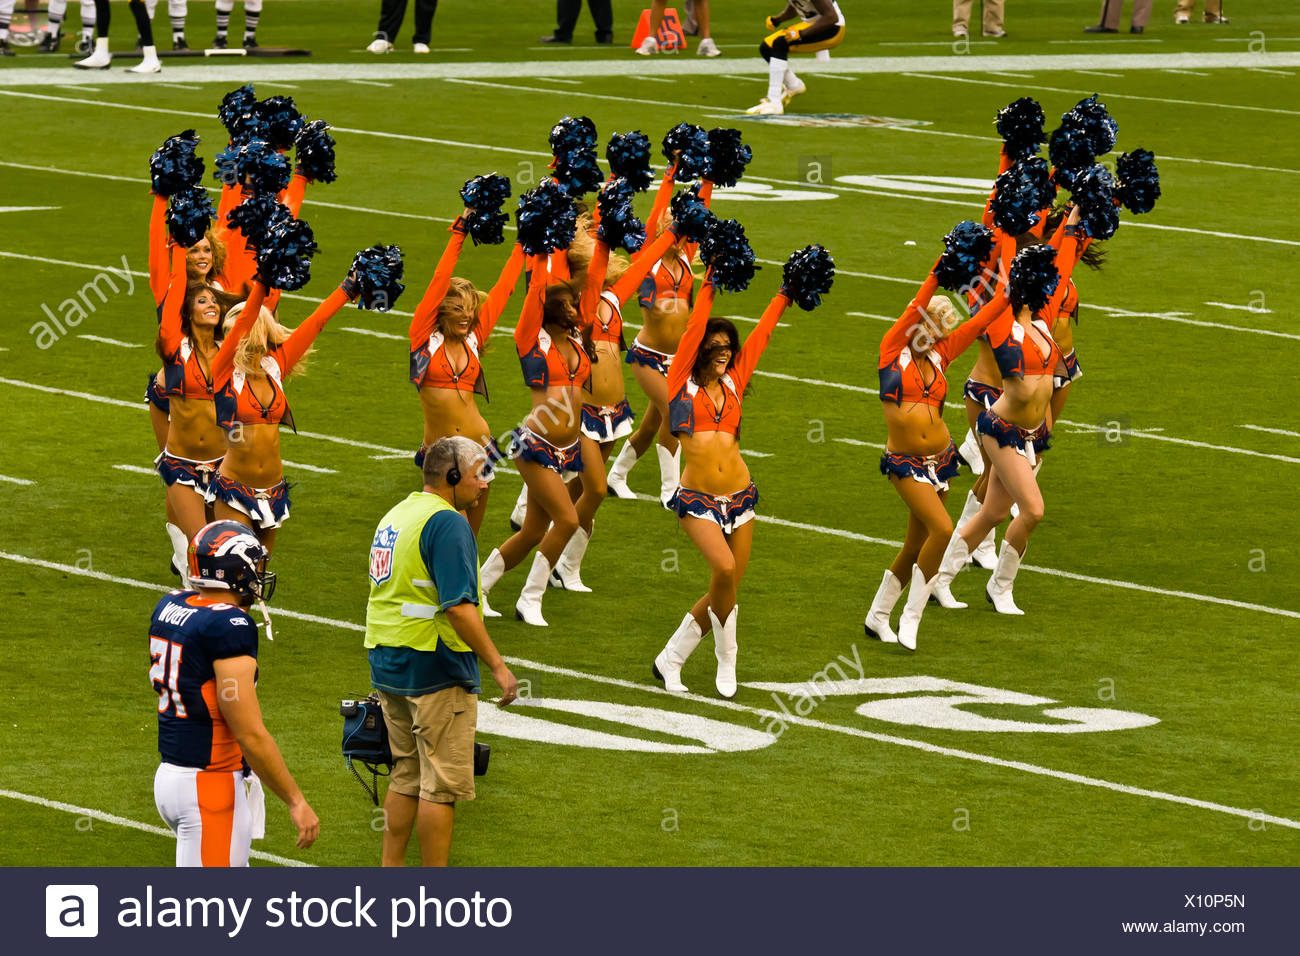 Denver Broncos Cheerleaders, Denver Broncos vs. Pittsburgh Steelers NFL football game, Invesco Field at Mile High (stadium), - Stock Image